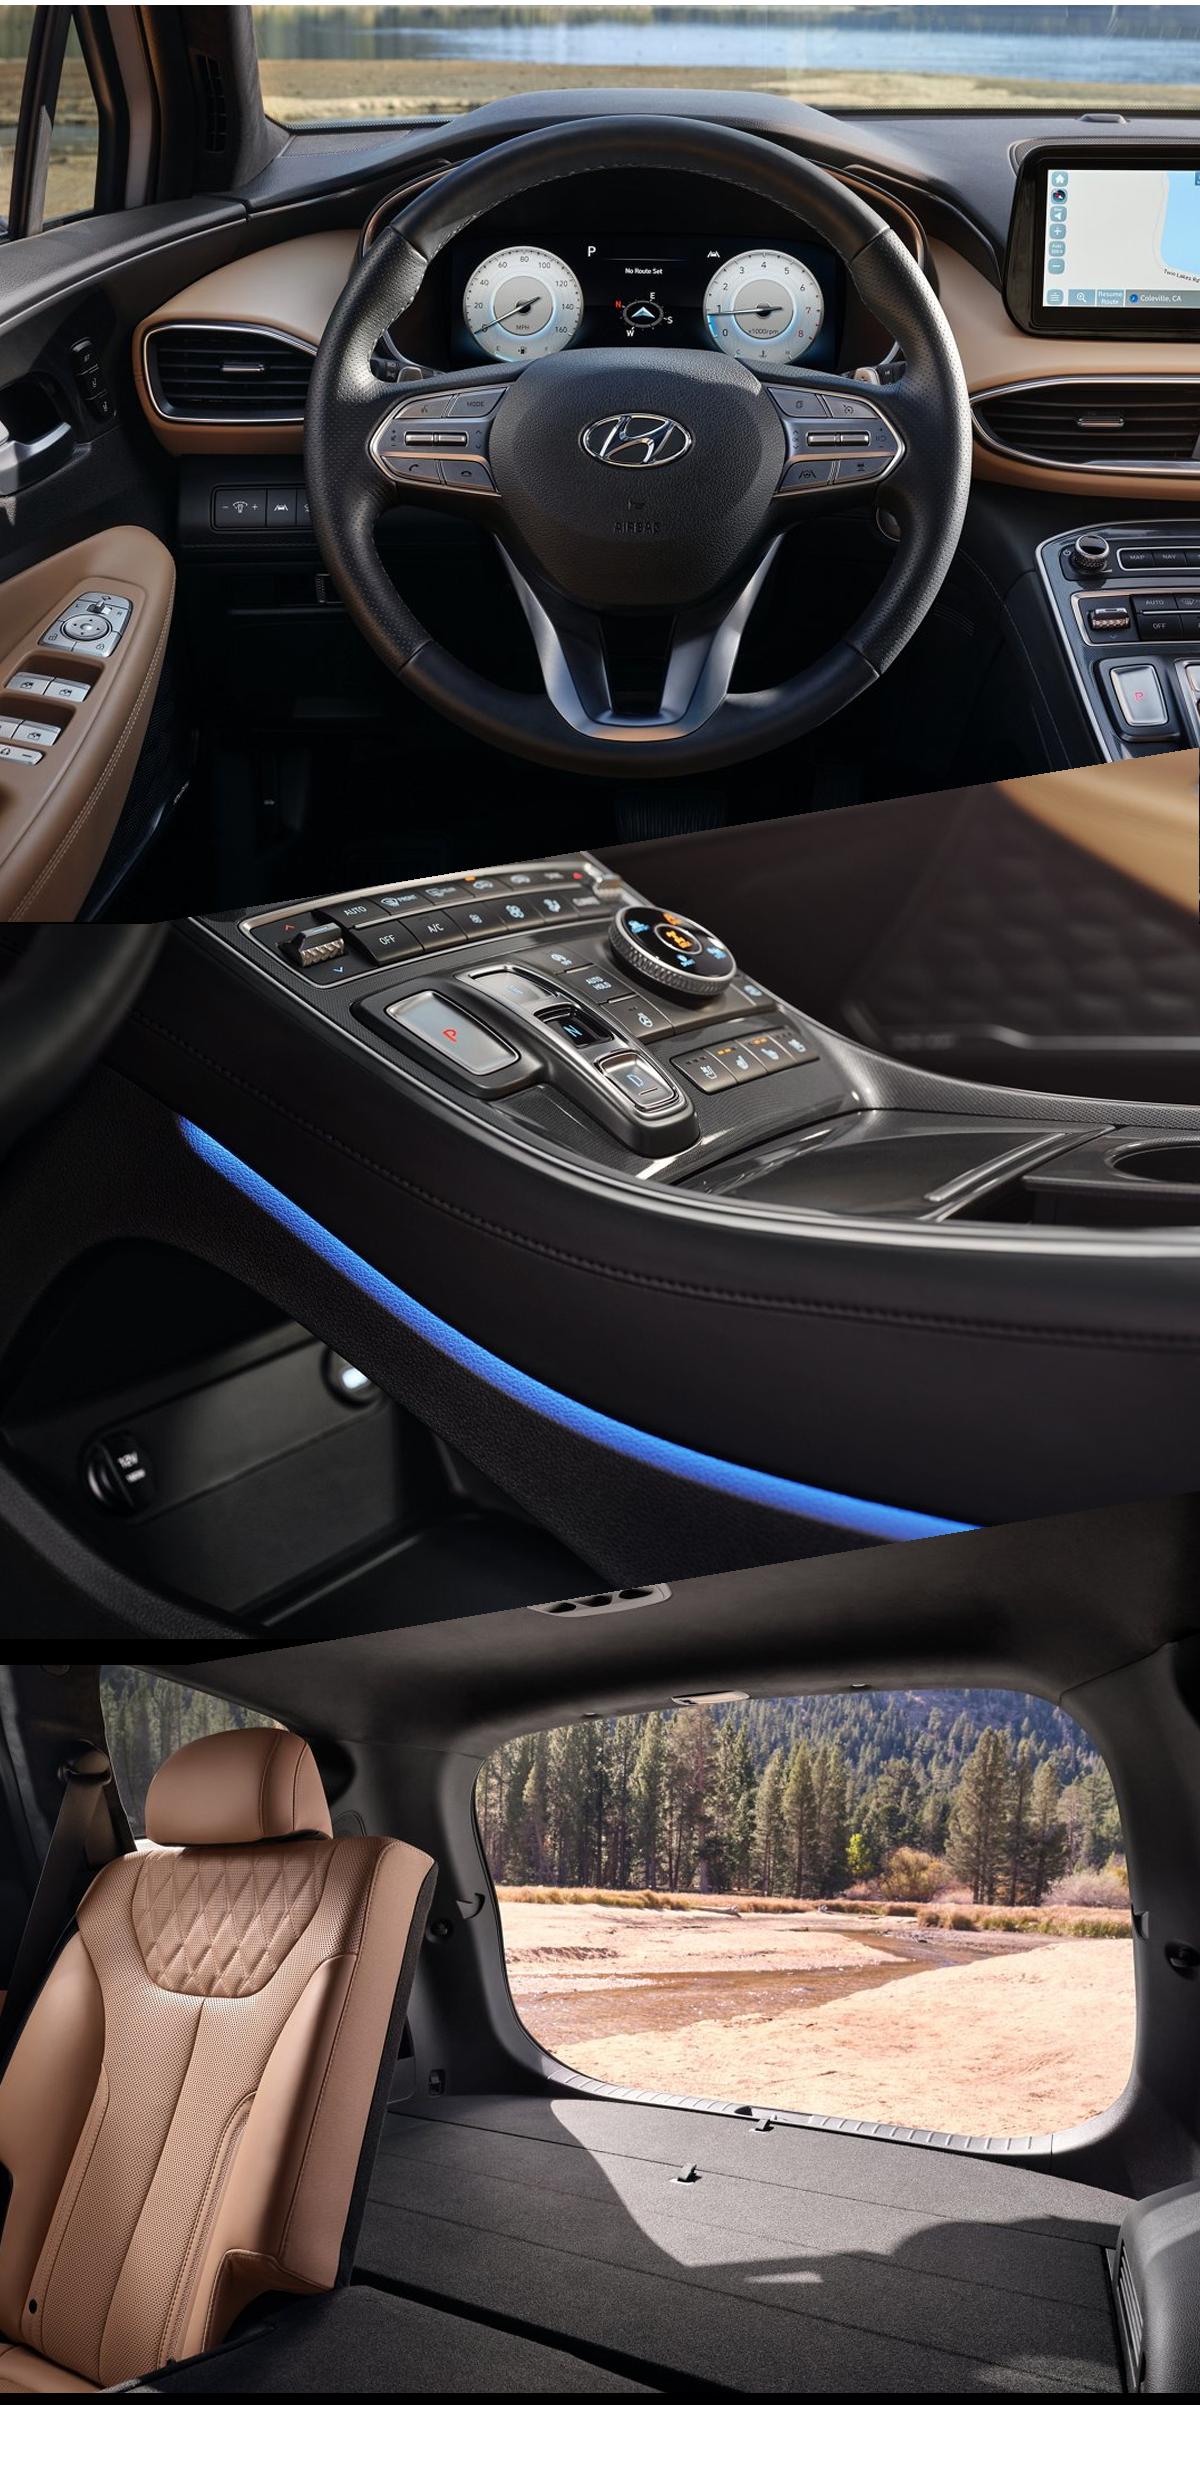 2021 Hyundai Santa Fe Interior Images